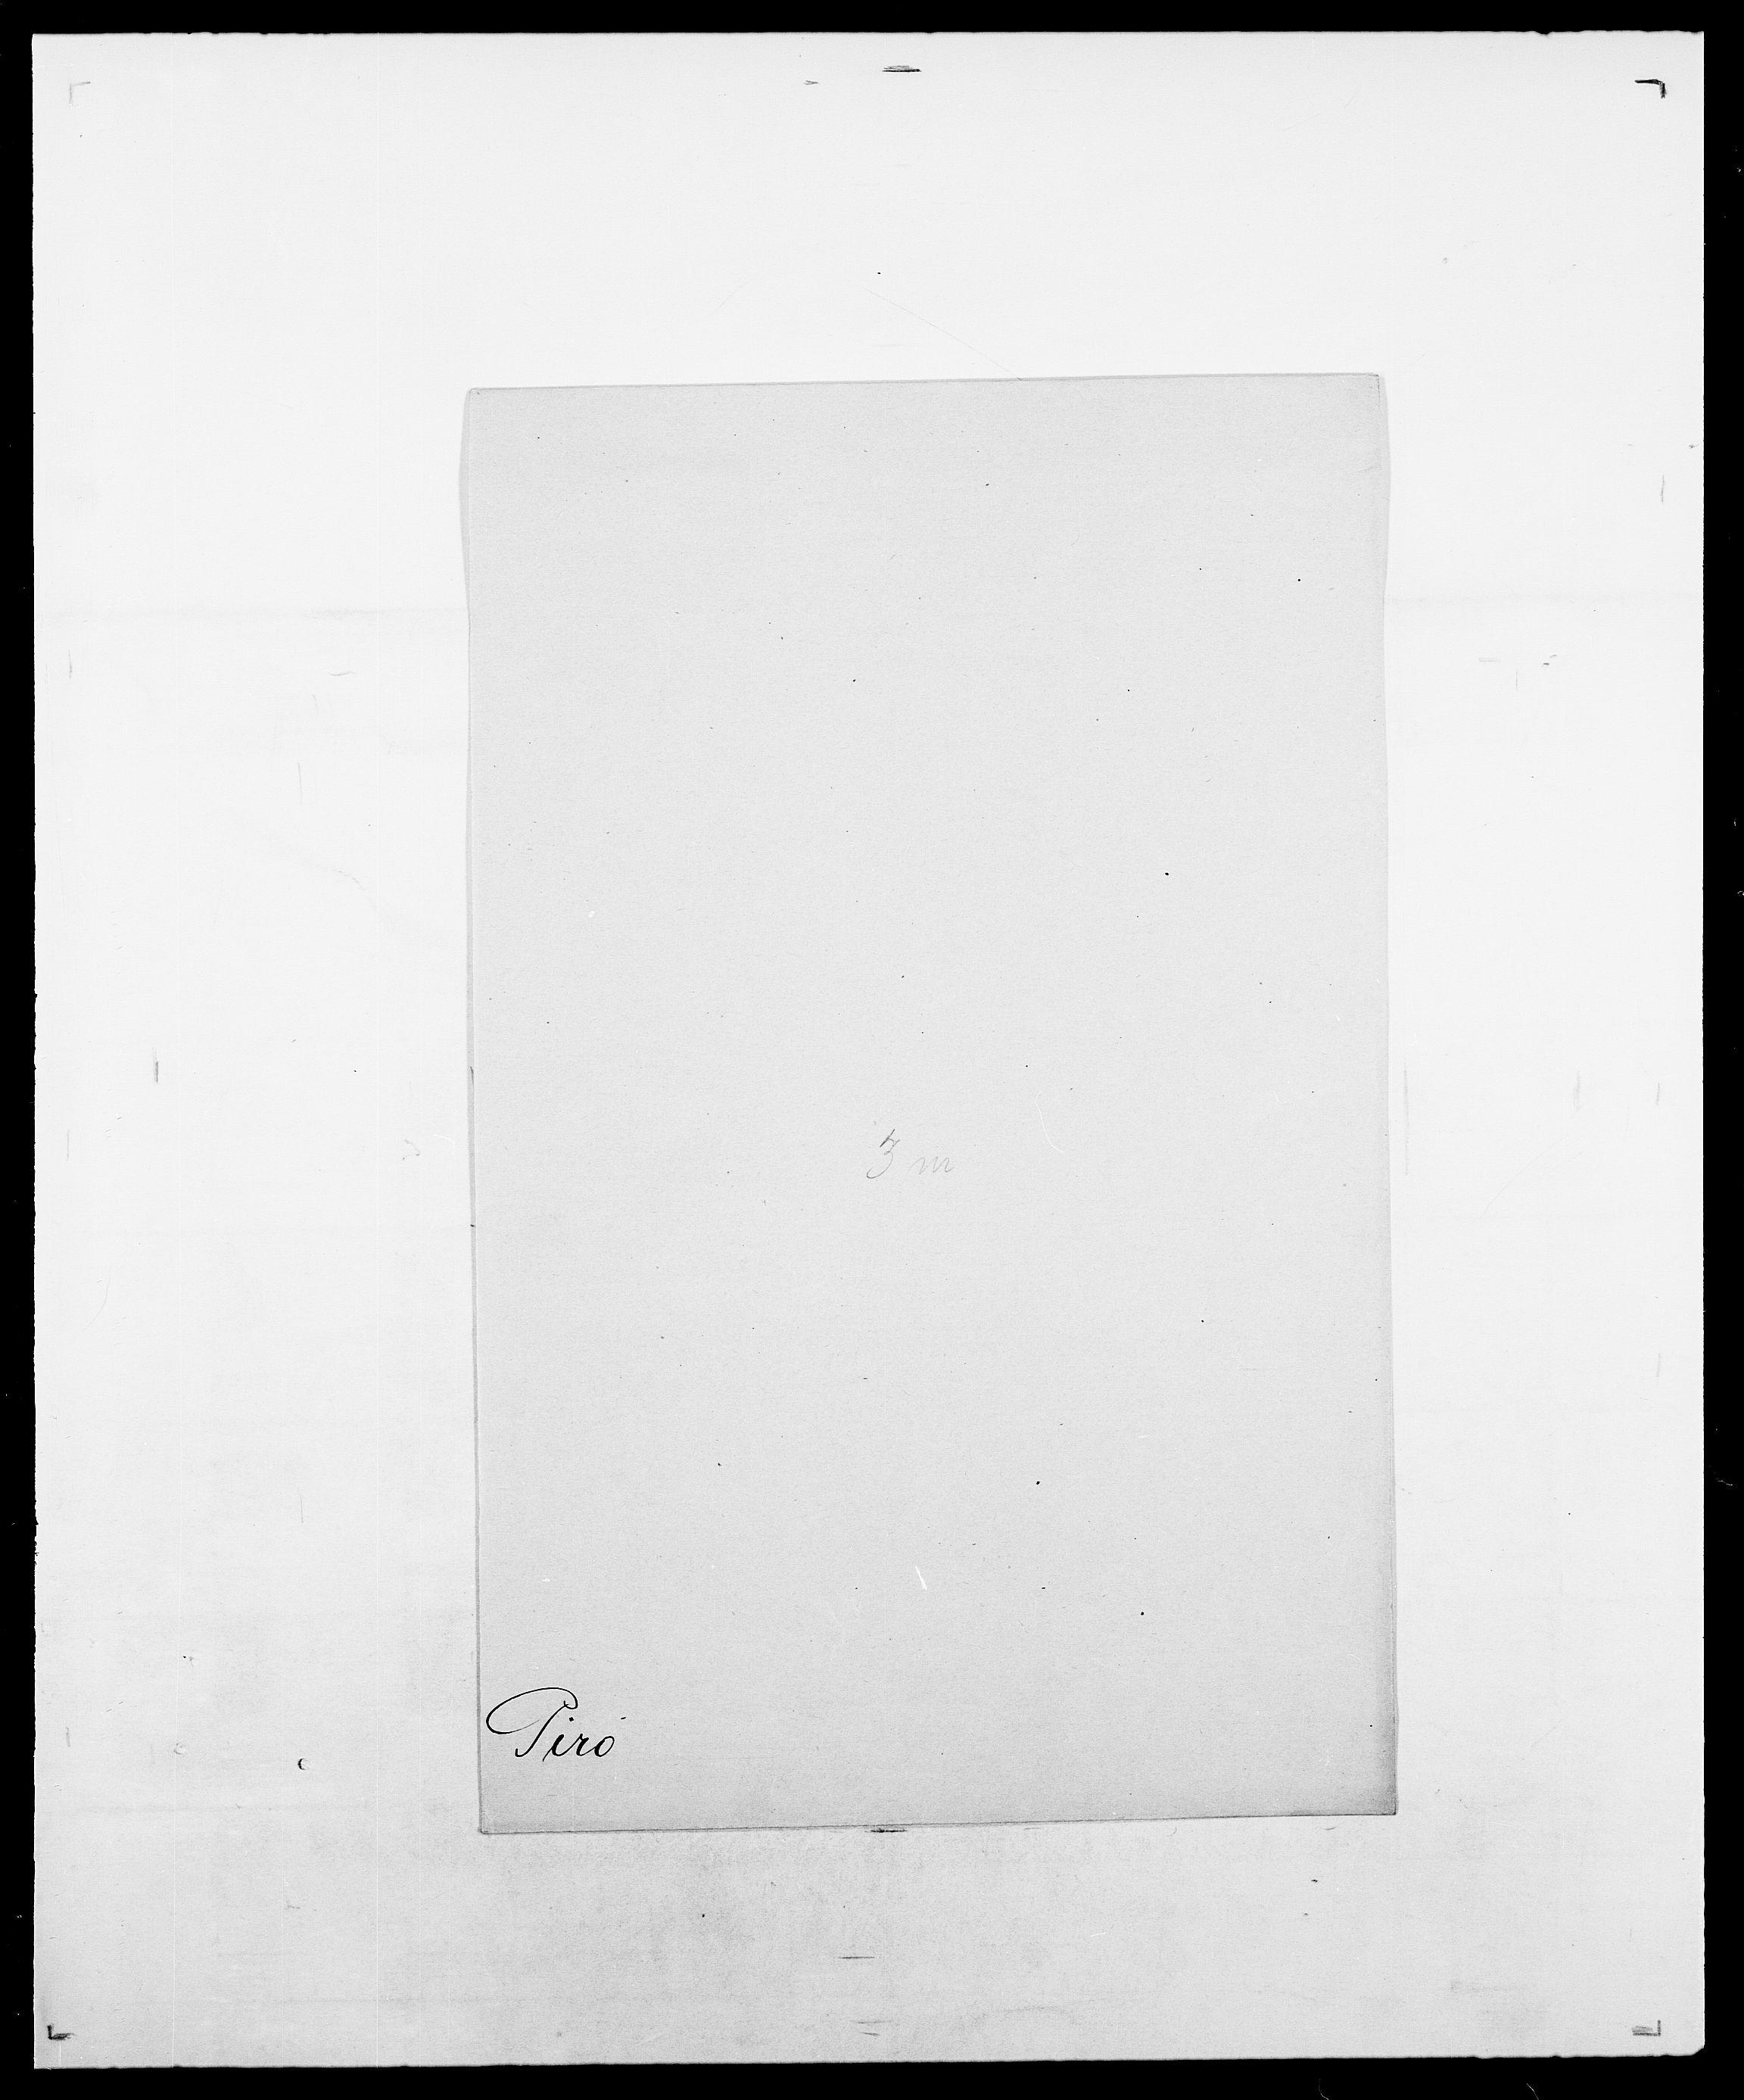 SAO, Delgobe, Charles Antoine - samling, D/Da/L0030: Paars - Pittelkov, s. 566